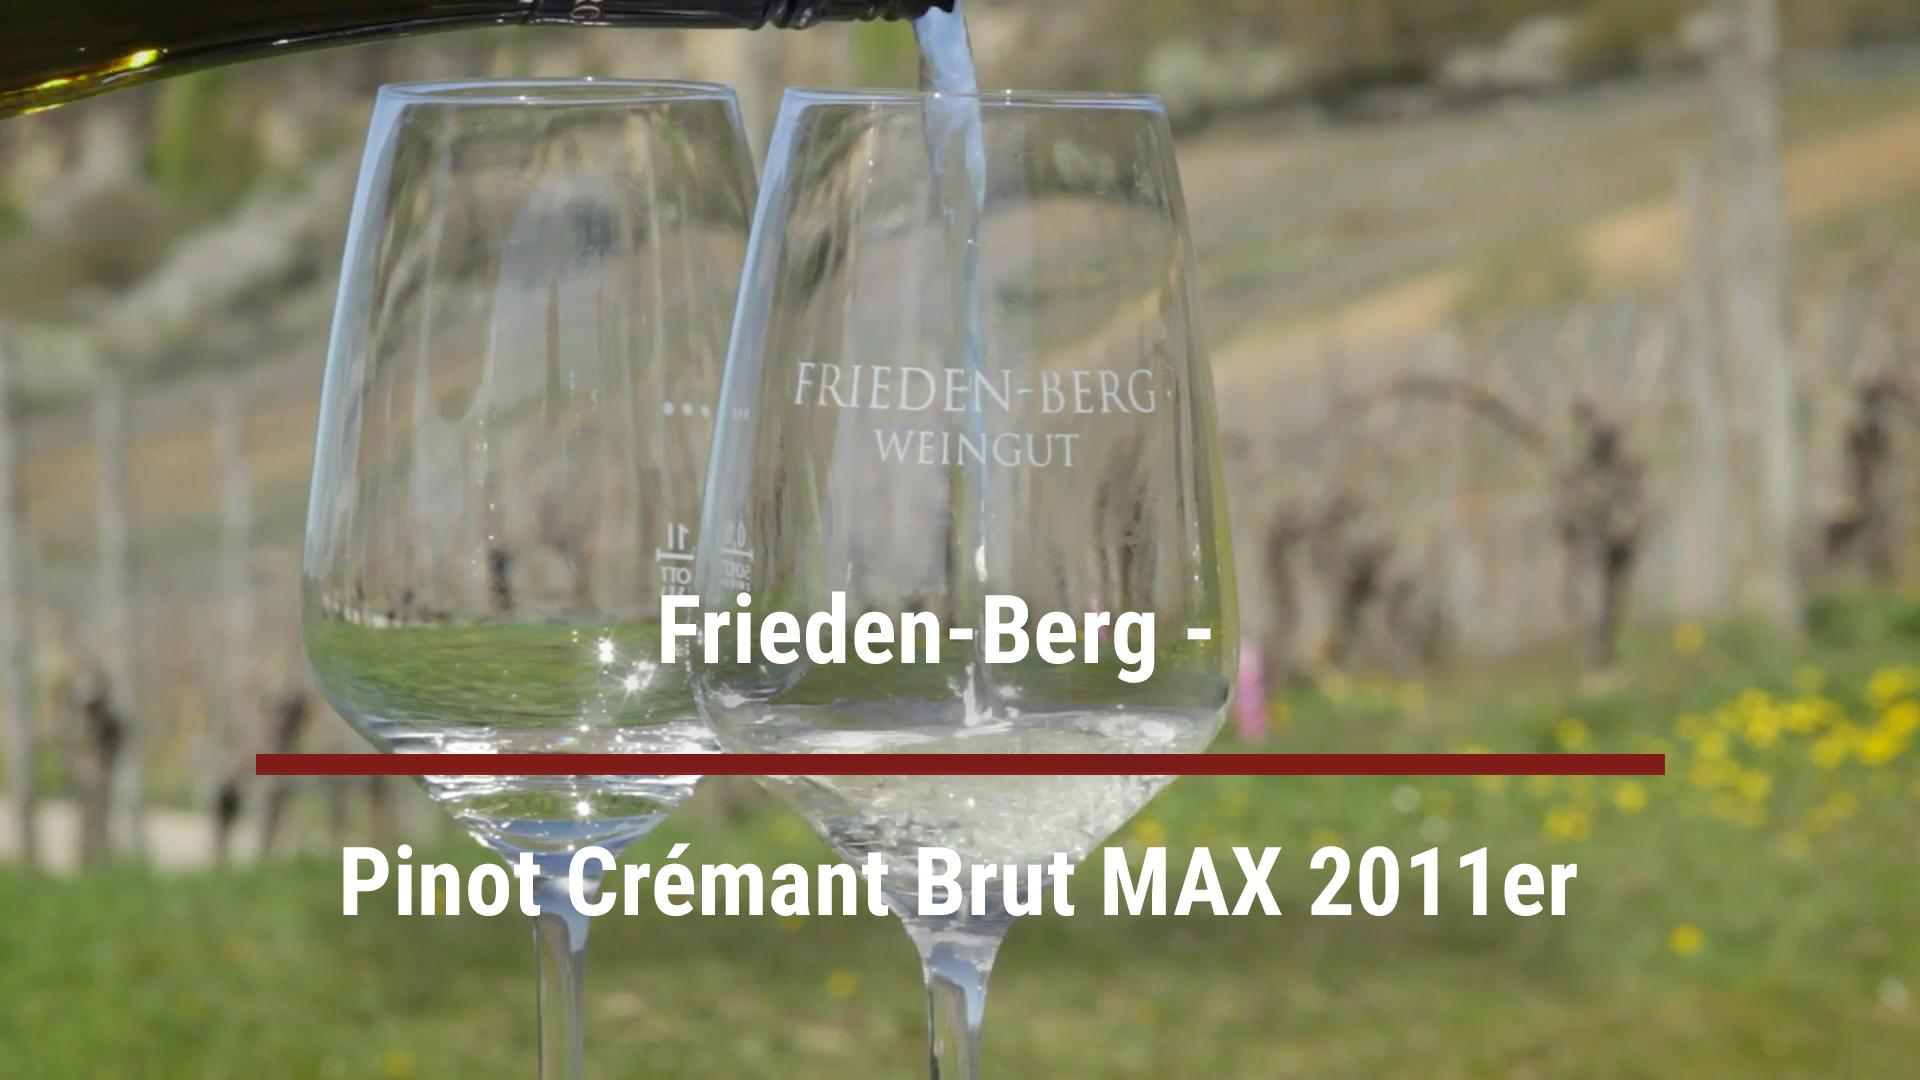 Frieden-Berg –  Pinot Crémant Brut MAX 2011er